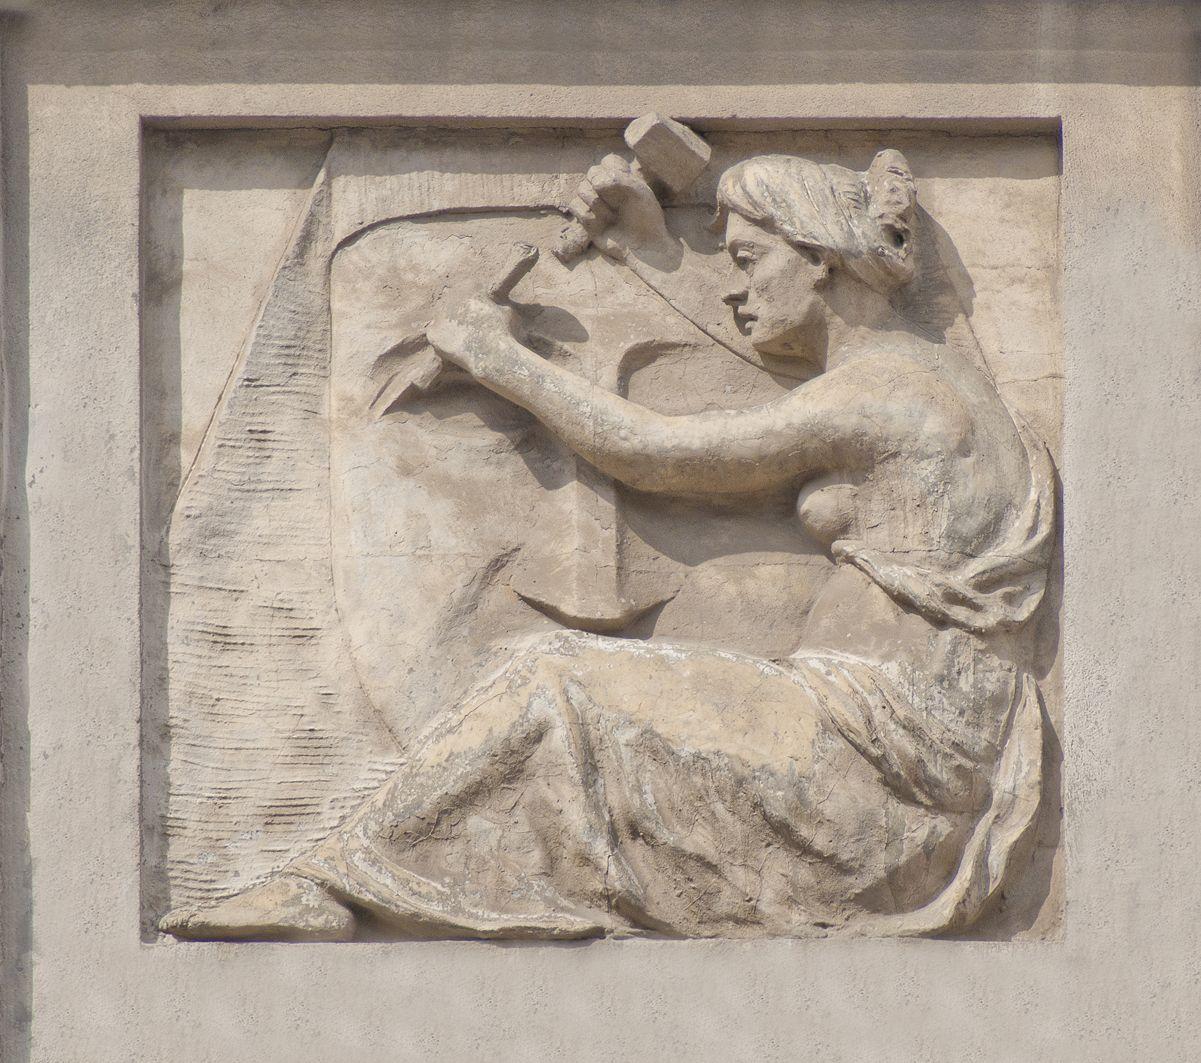 Юліуш Войцех Белтовський. Скульптура, 1911 (вул. Чупринки, 60)